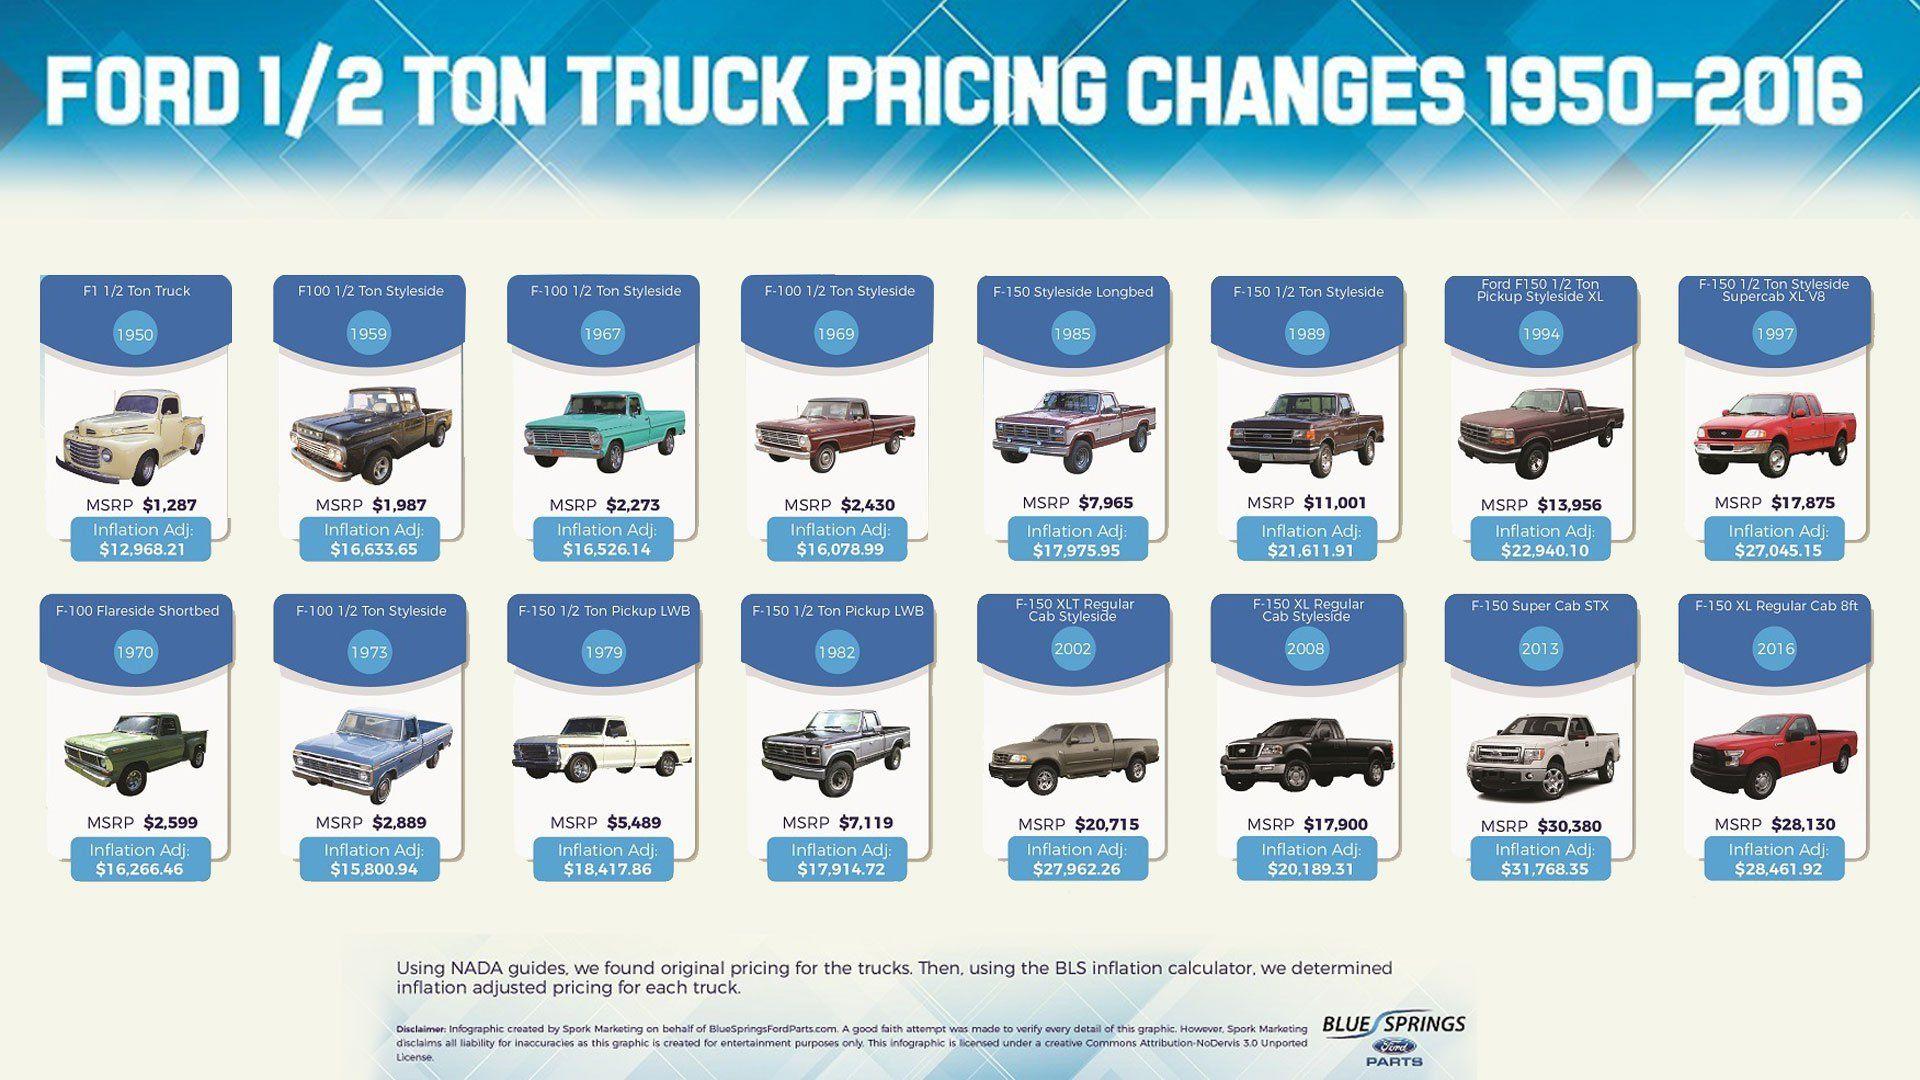 Ford F 150 Price Changes Jpeg Jpeg Image 1920 1080 Pixels